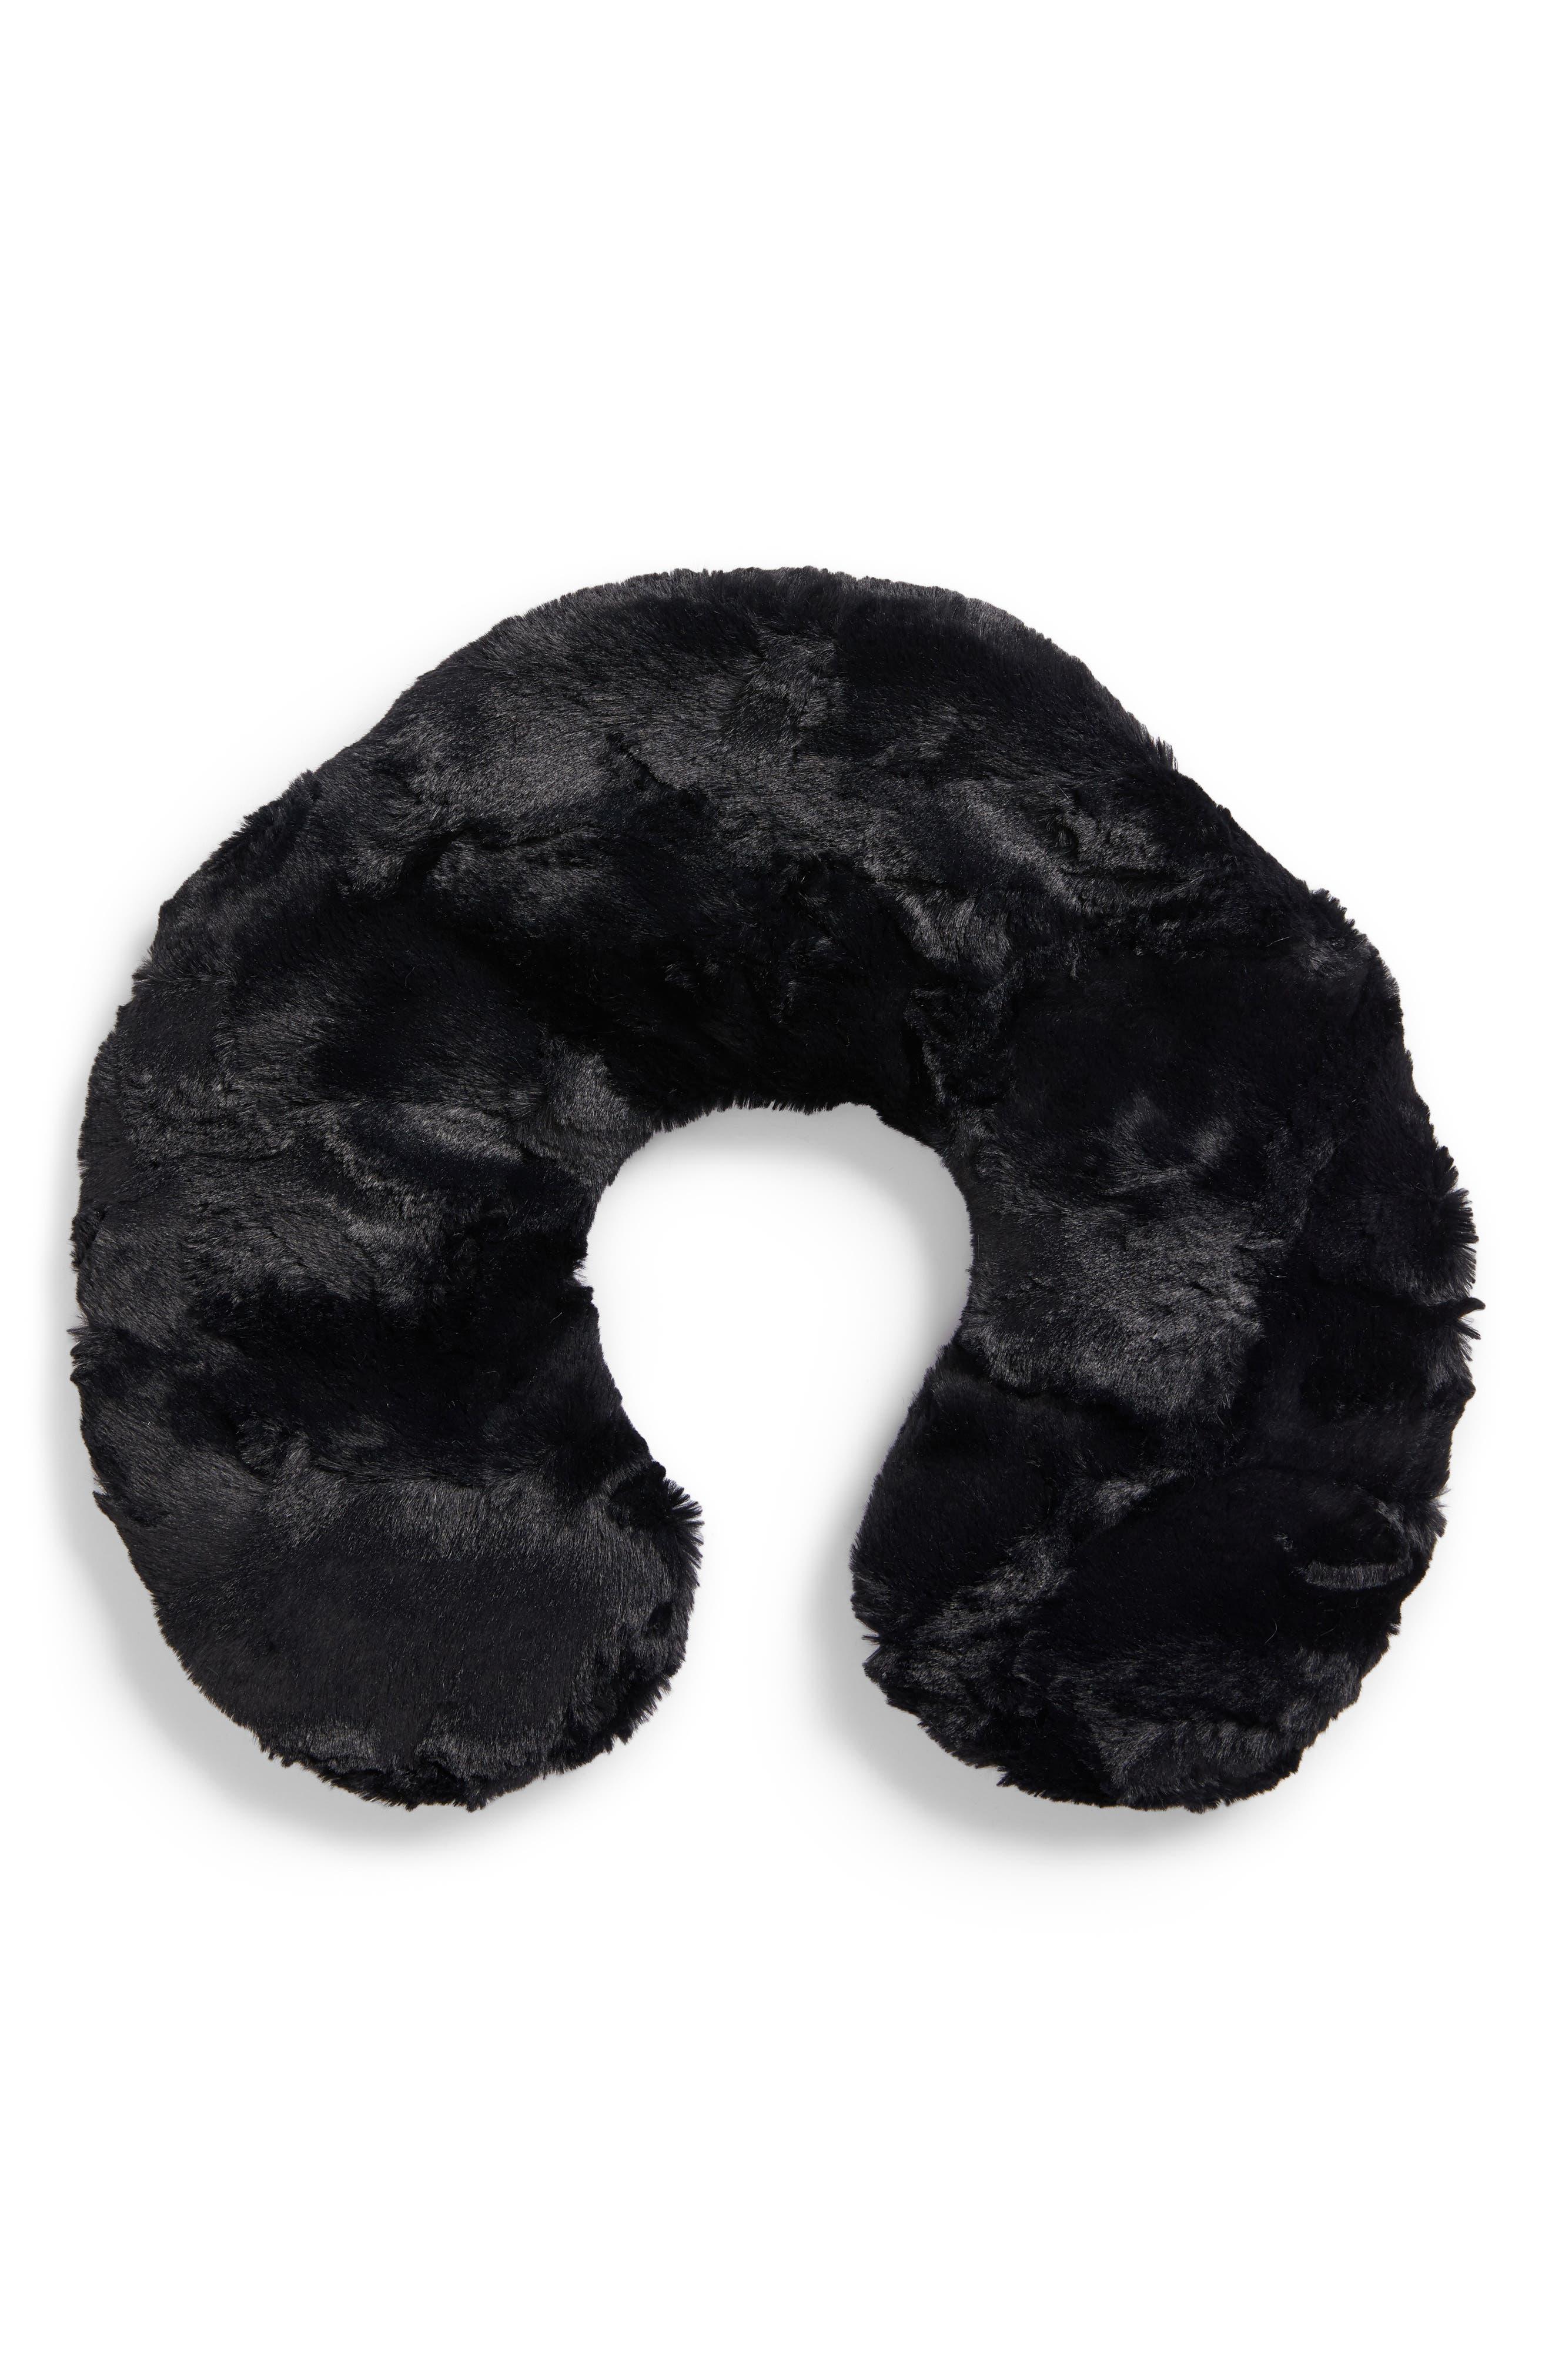 SONOMA LAVENDER Caviar Black Neck Pillow, Main, color, NO COLOR